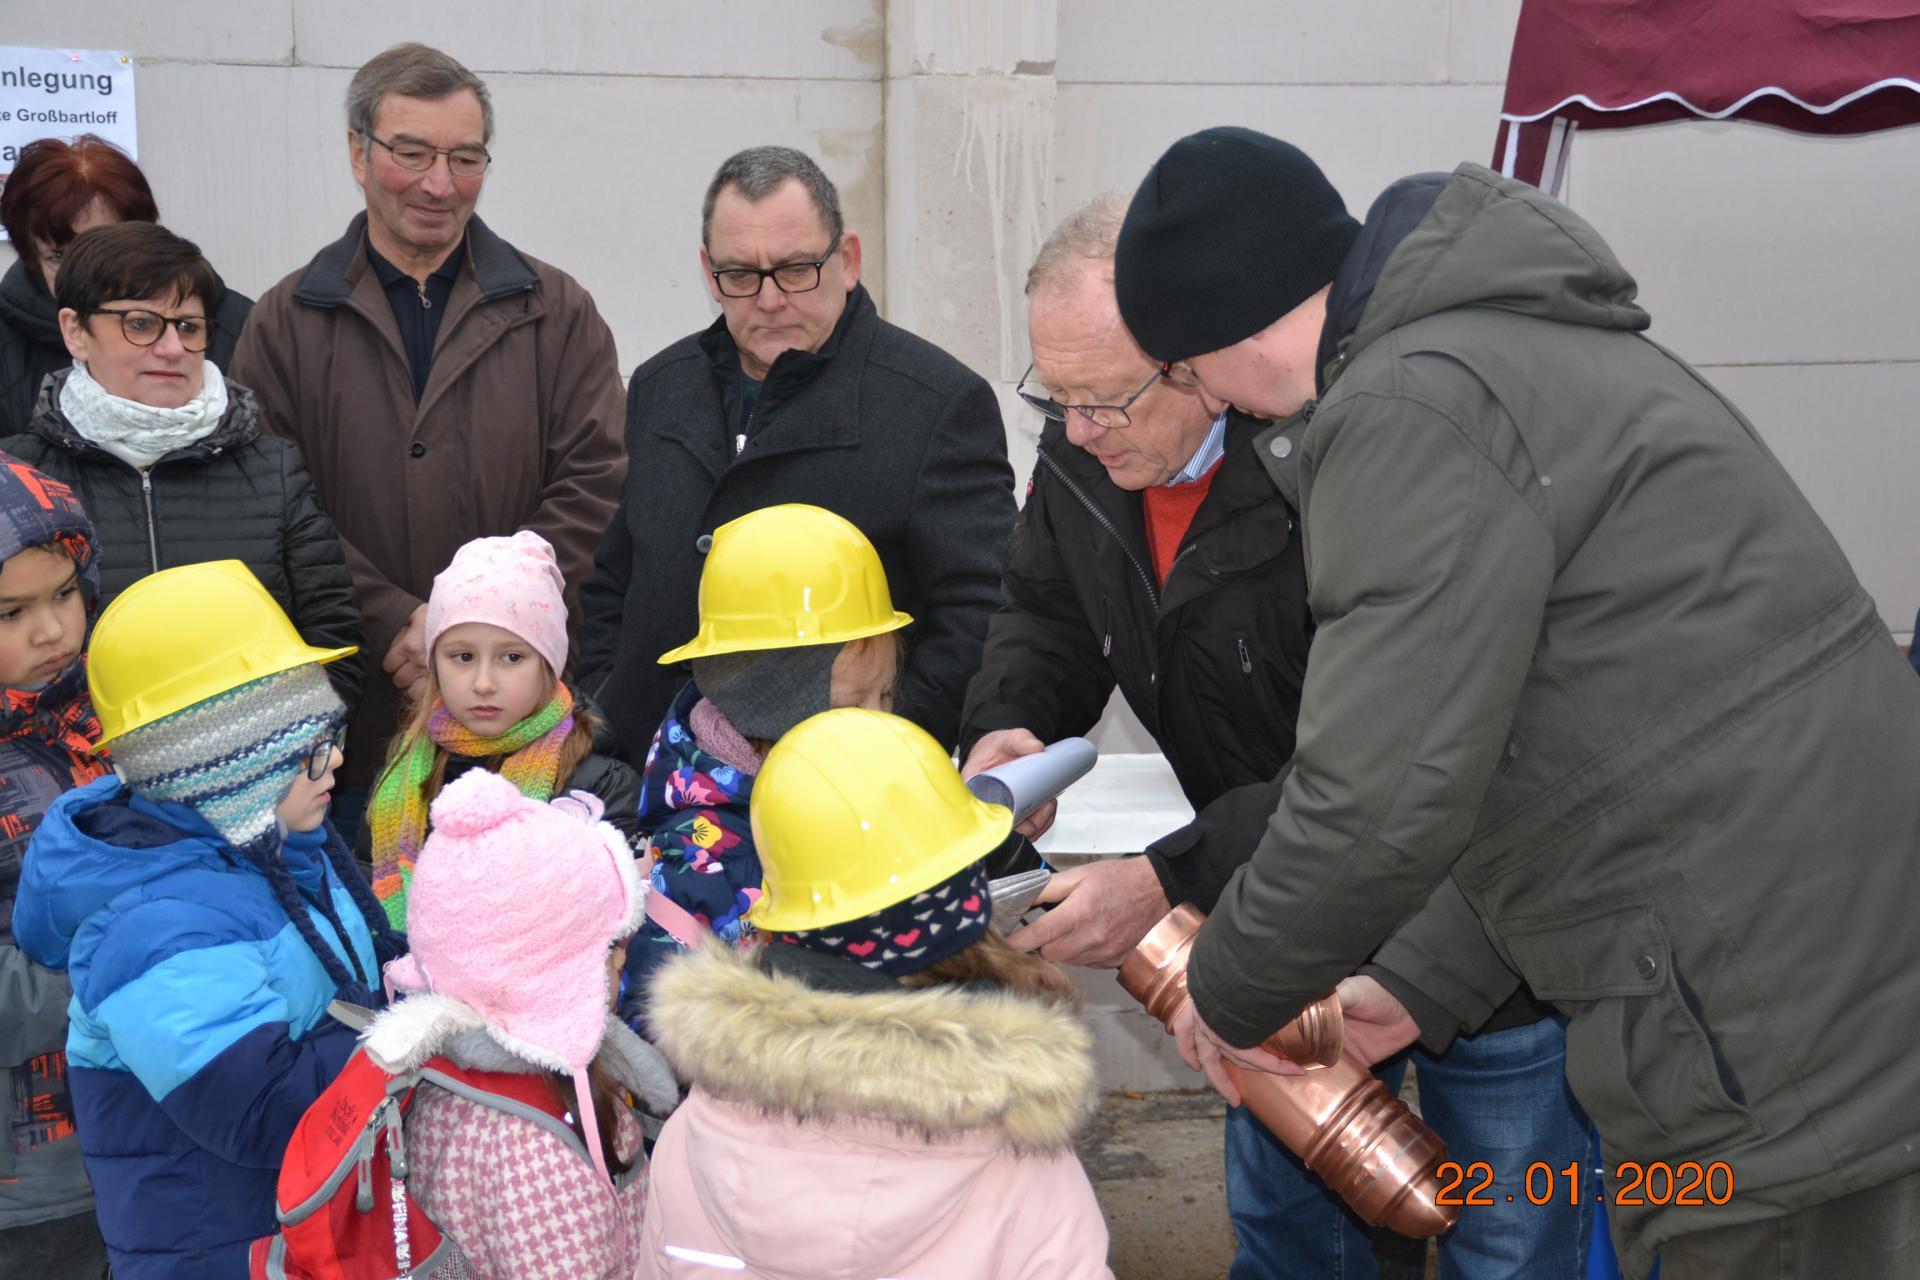 Kindergarten Großbartloff